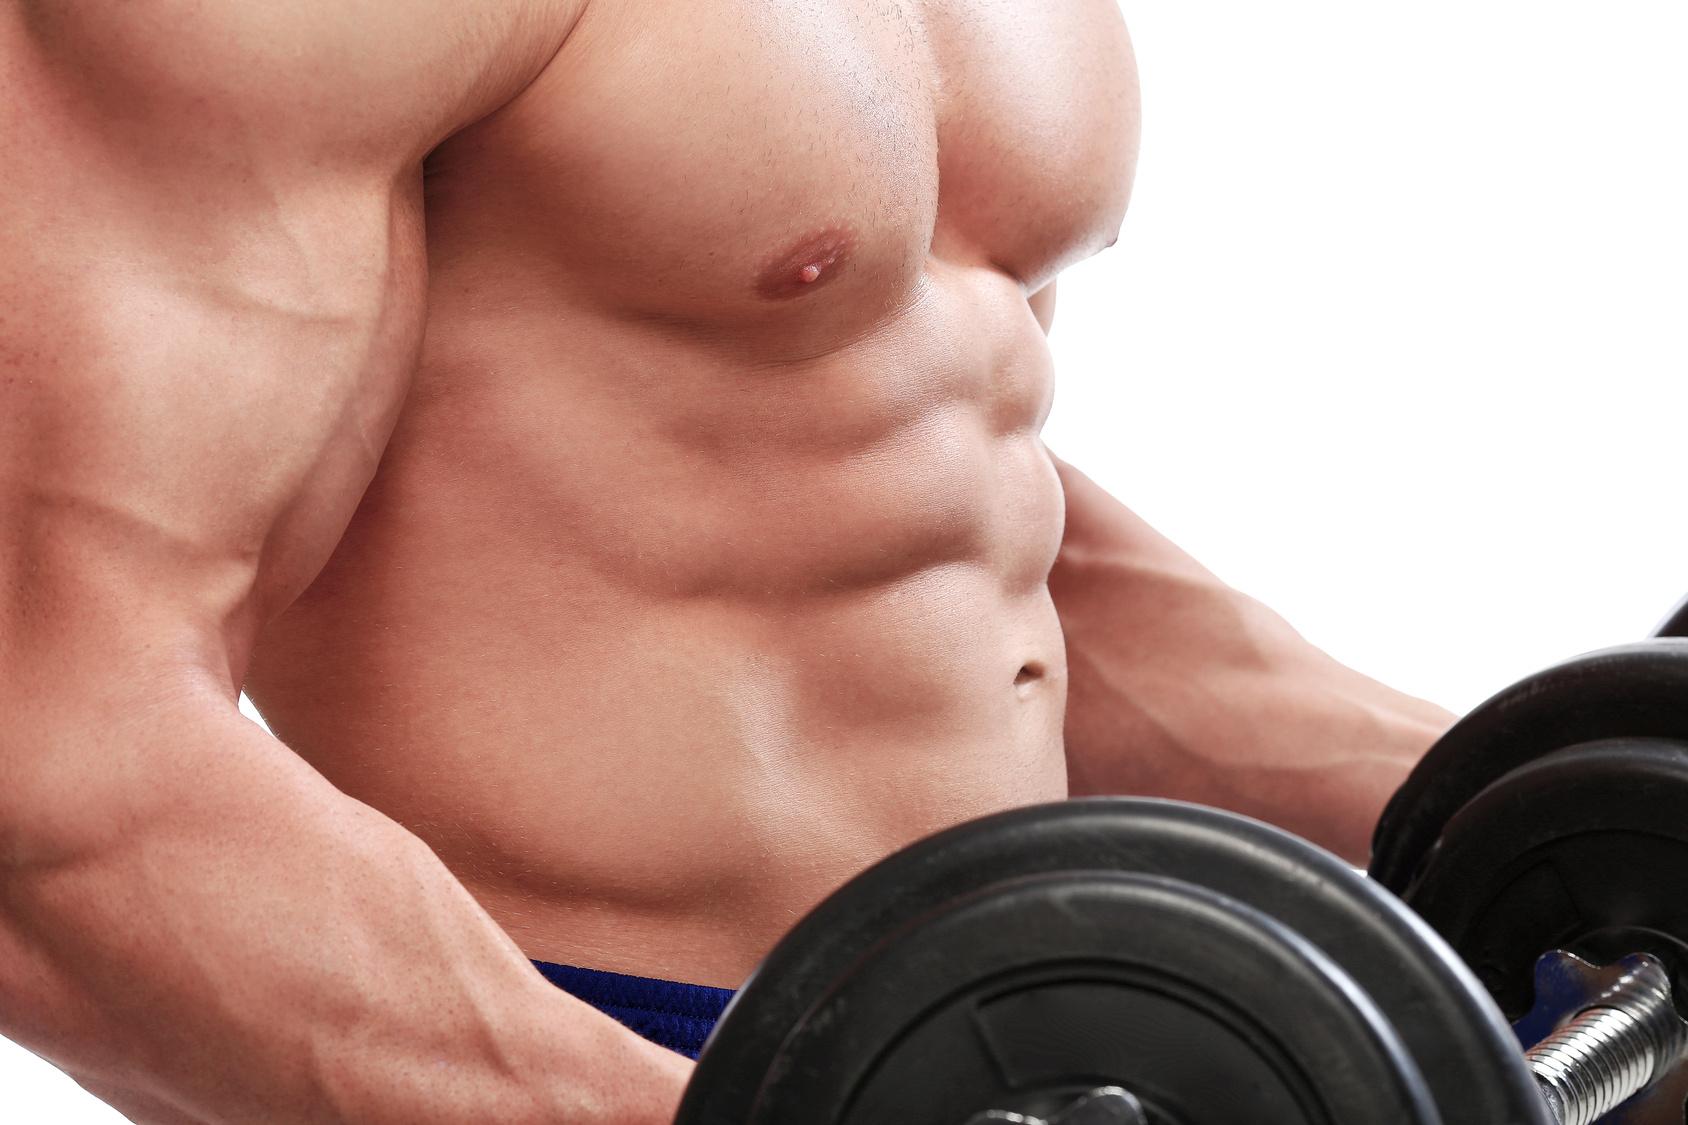 testosteron nach ejakulation